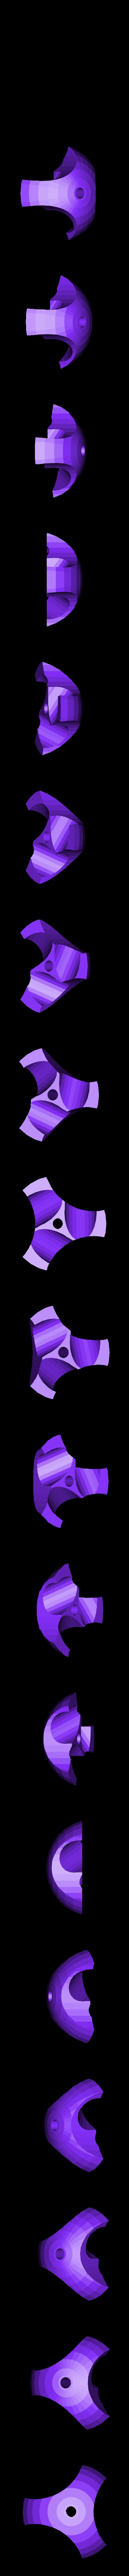 tube_clamp_12mm.stl Download free STL file Parametric Tube Clamp • Design to 3D print, Azagal